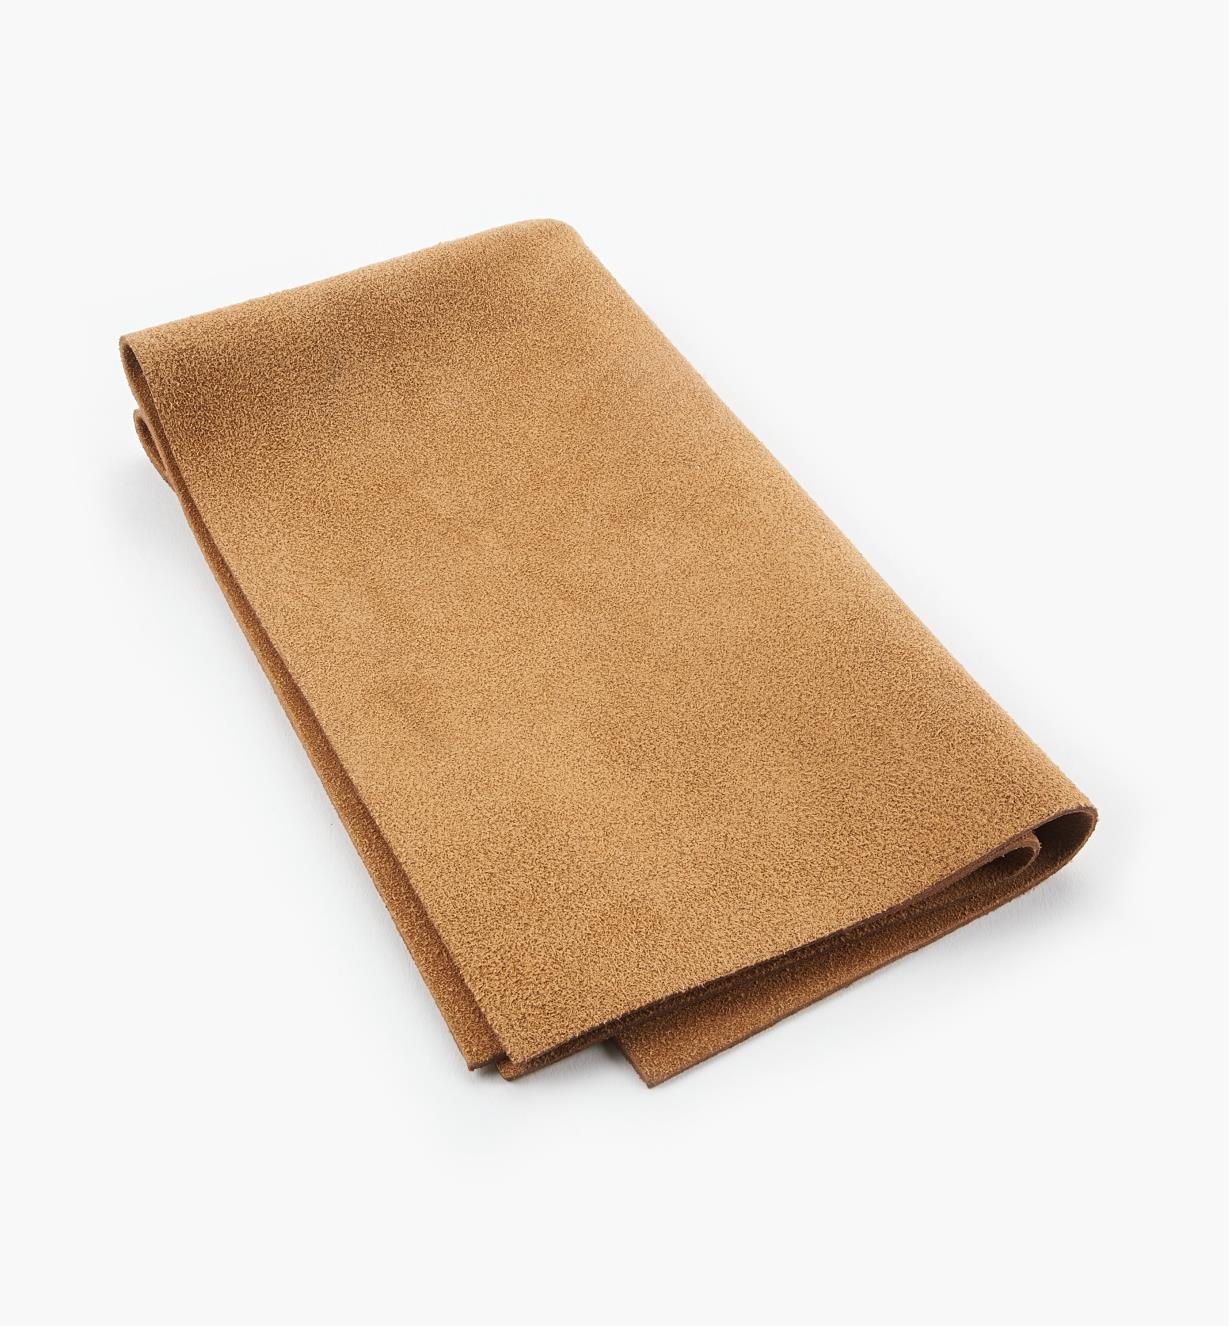 30cm × 50cm Split Leather Sheet